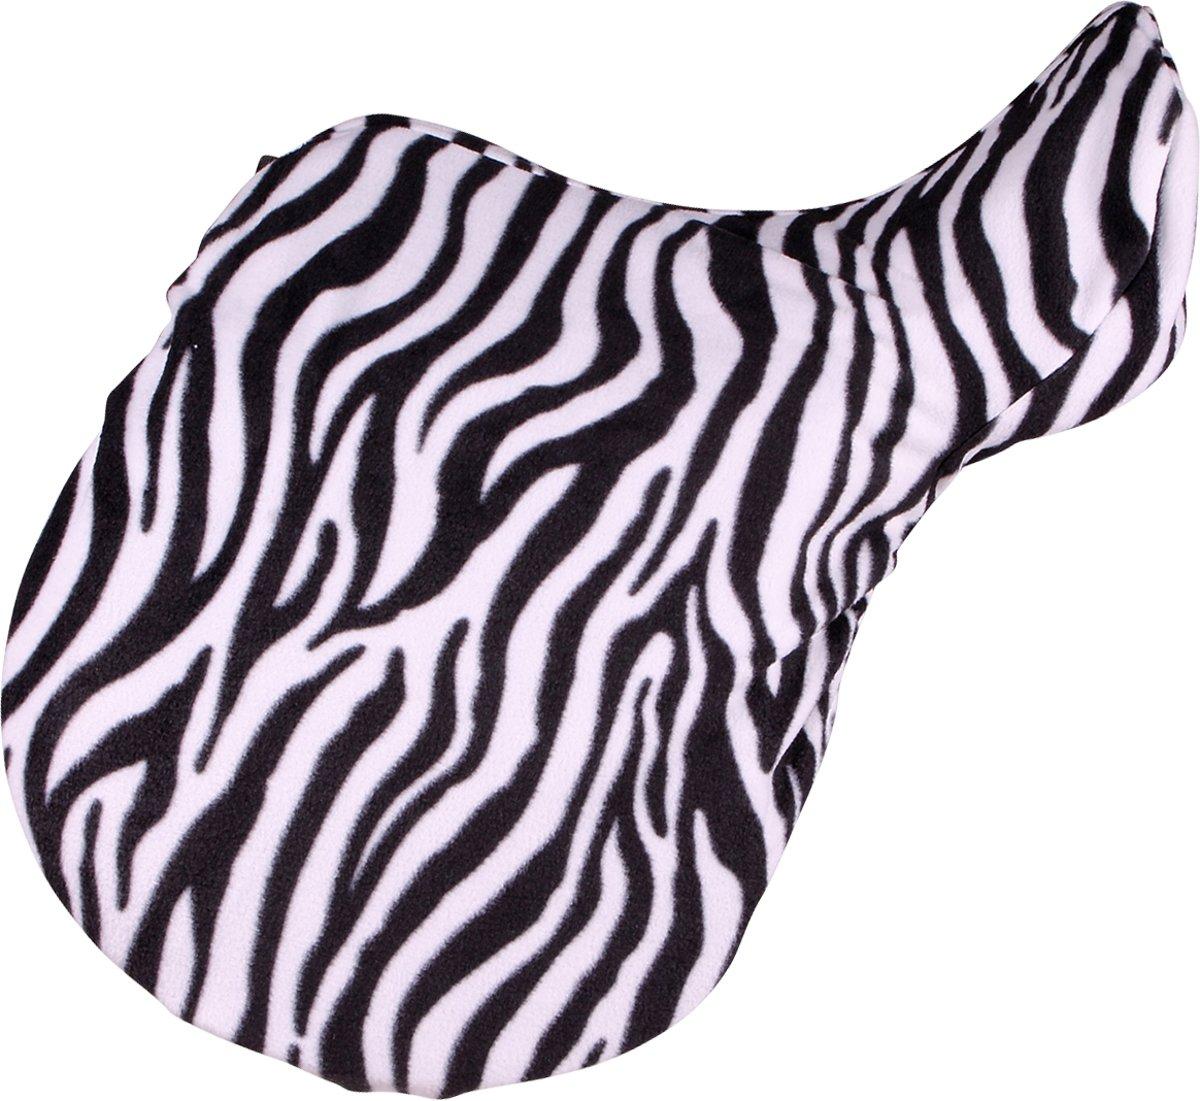 Epplejeck Zadelhoes  Zebra - Zebra kopen